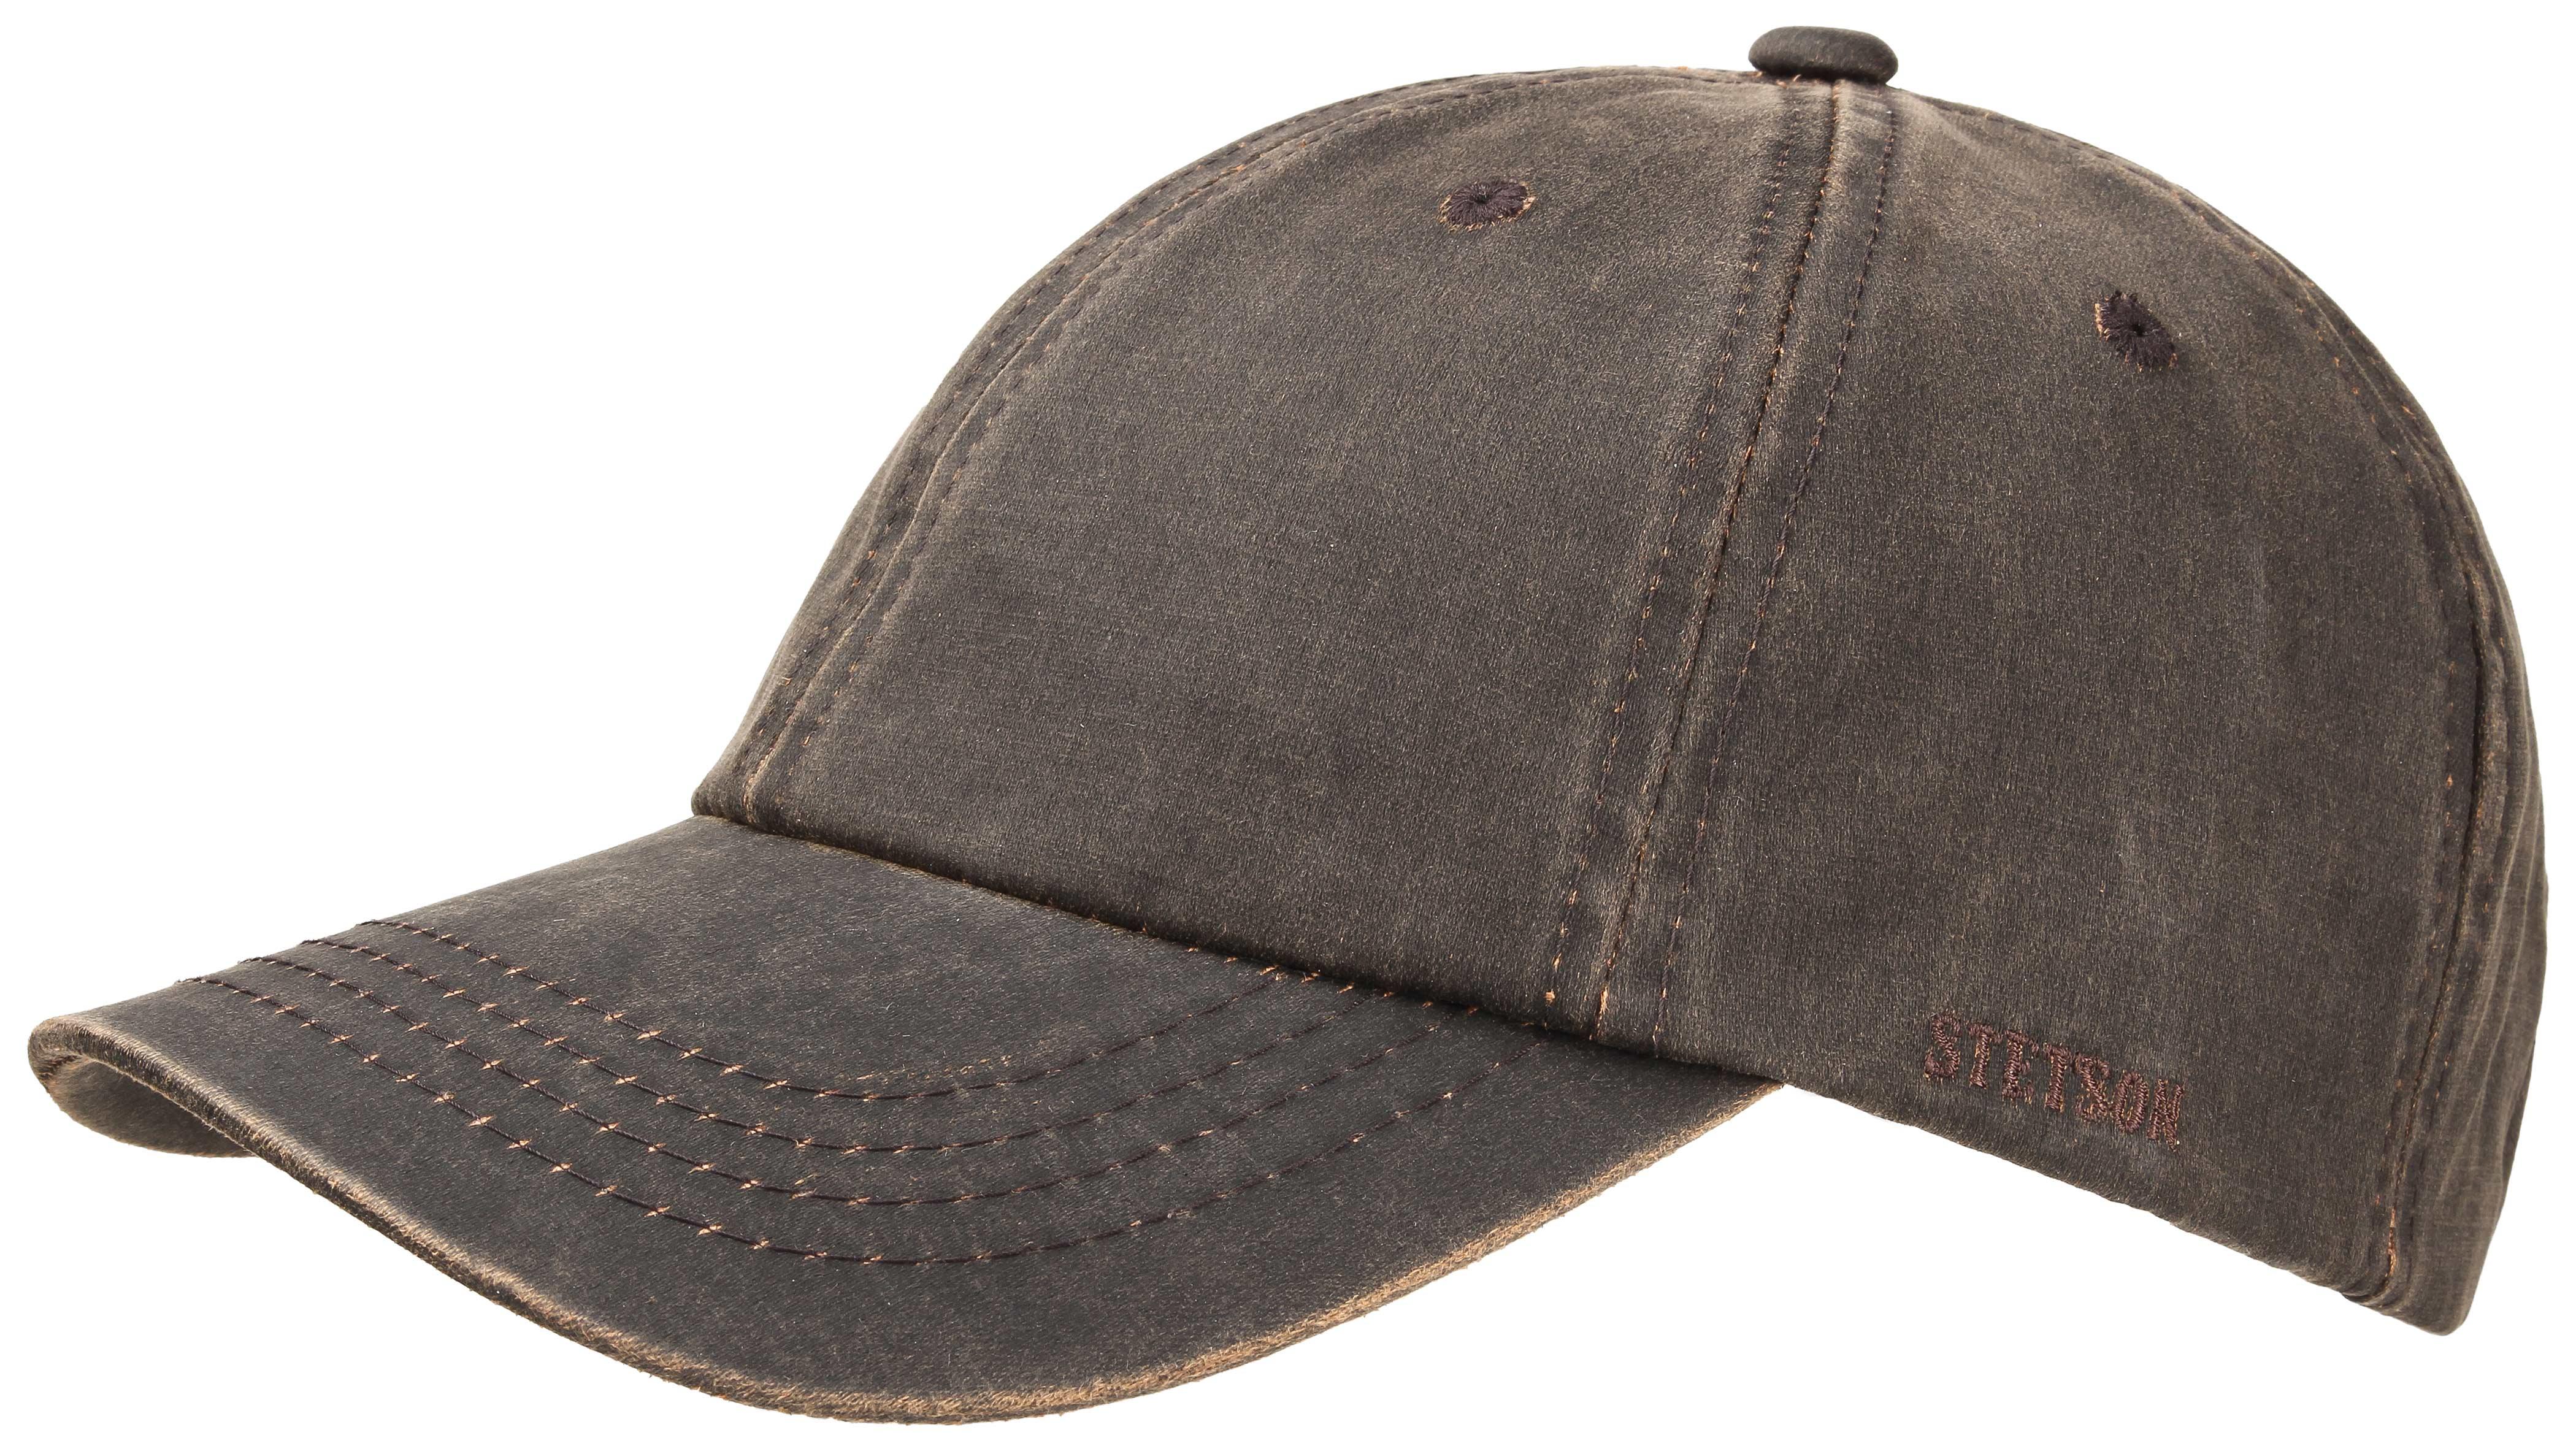 Casquette baseball Statesboro Stetson marron - Kausia 53755a691c9